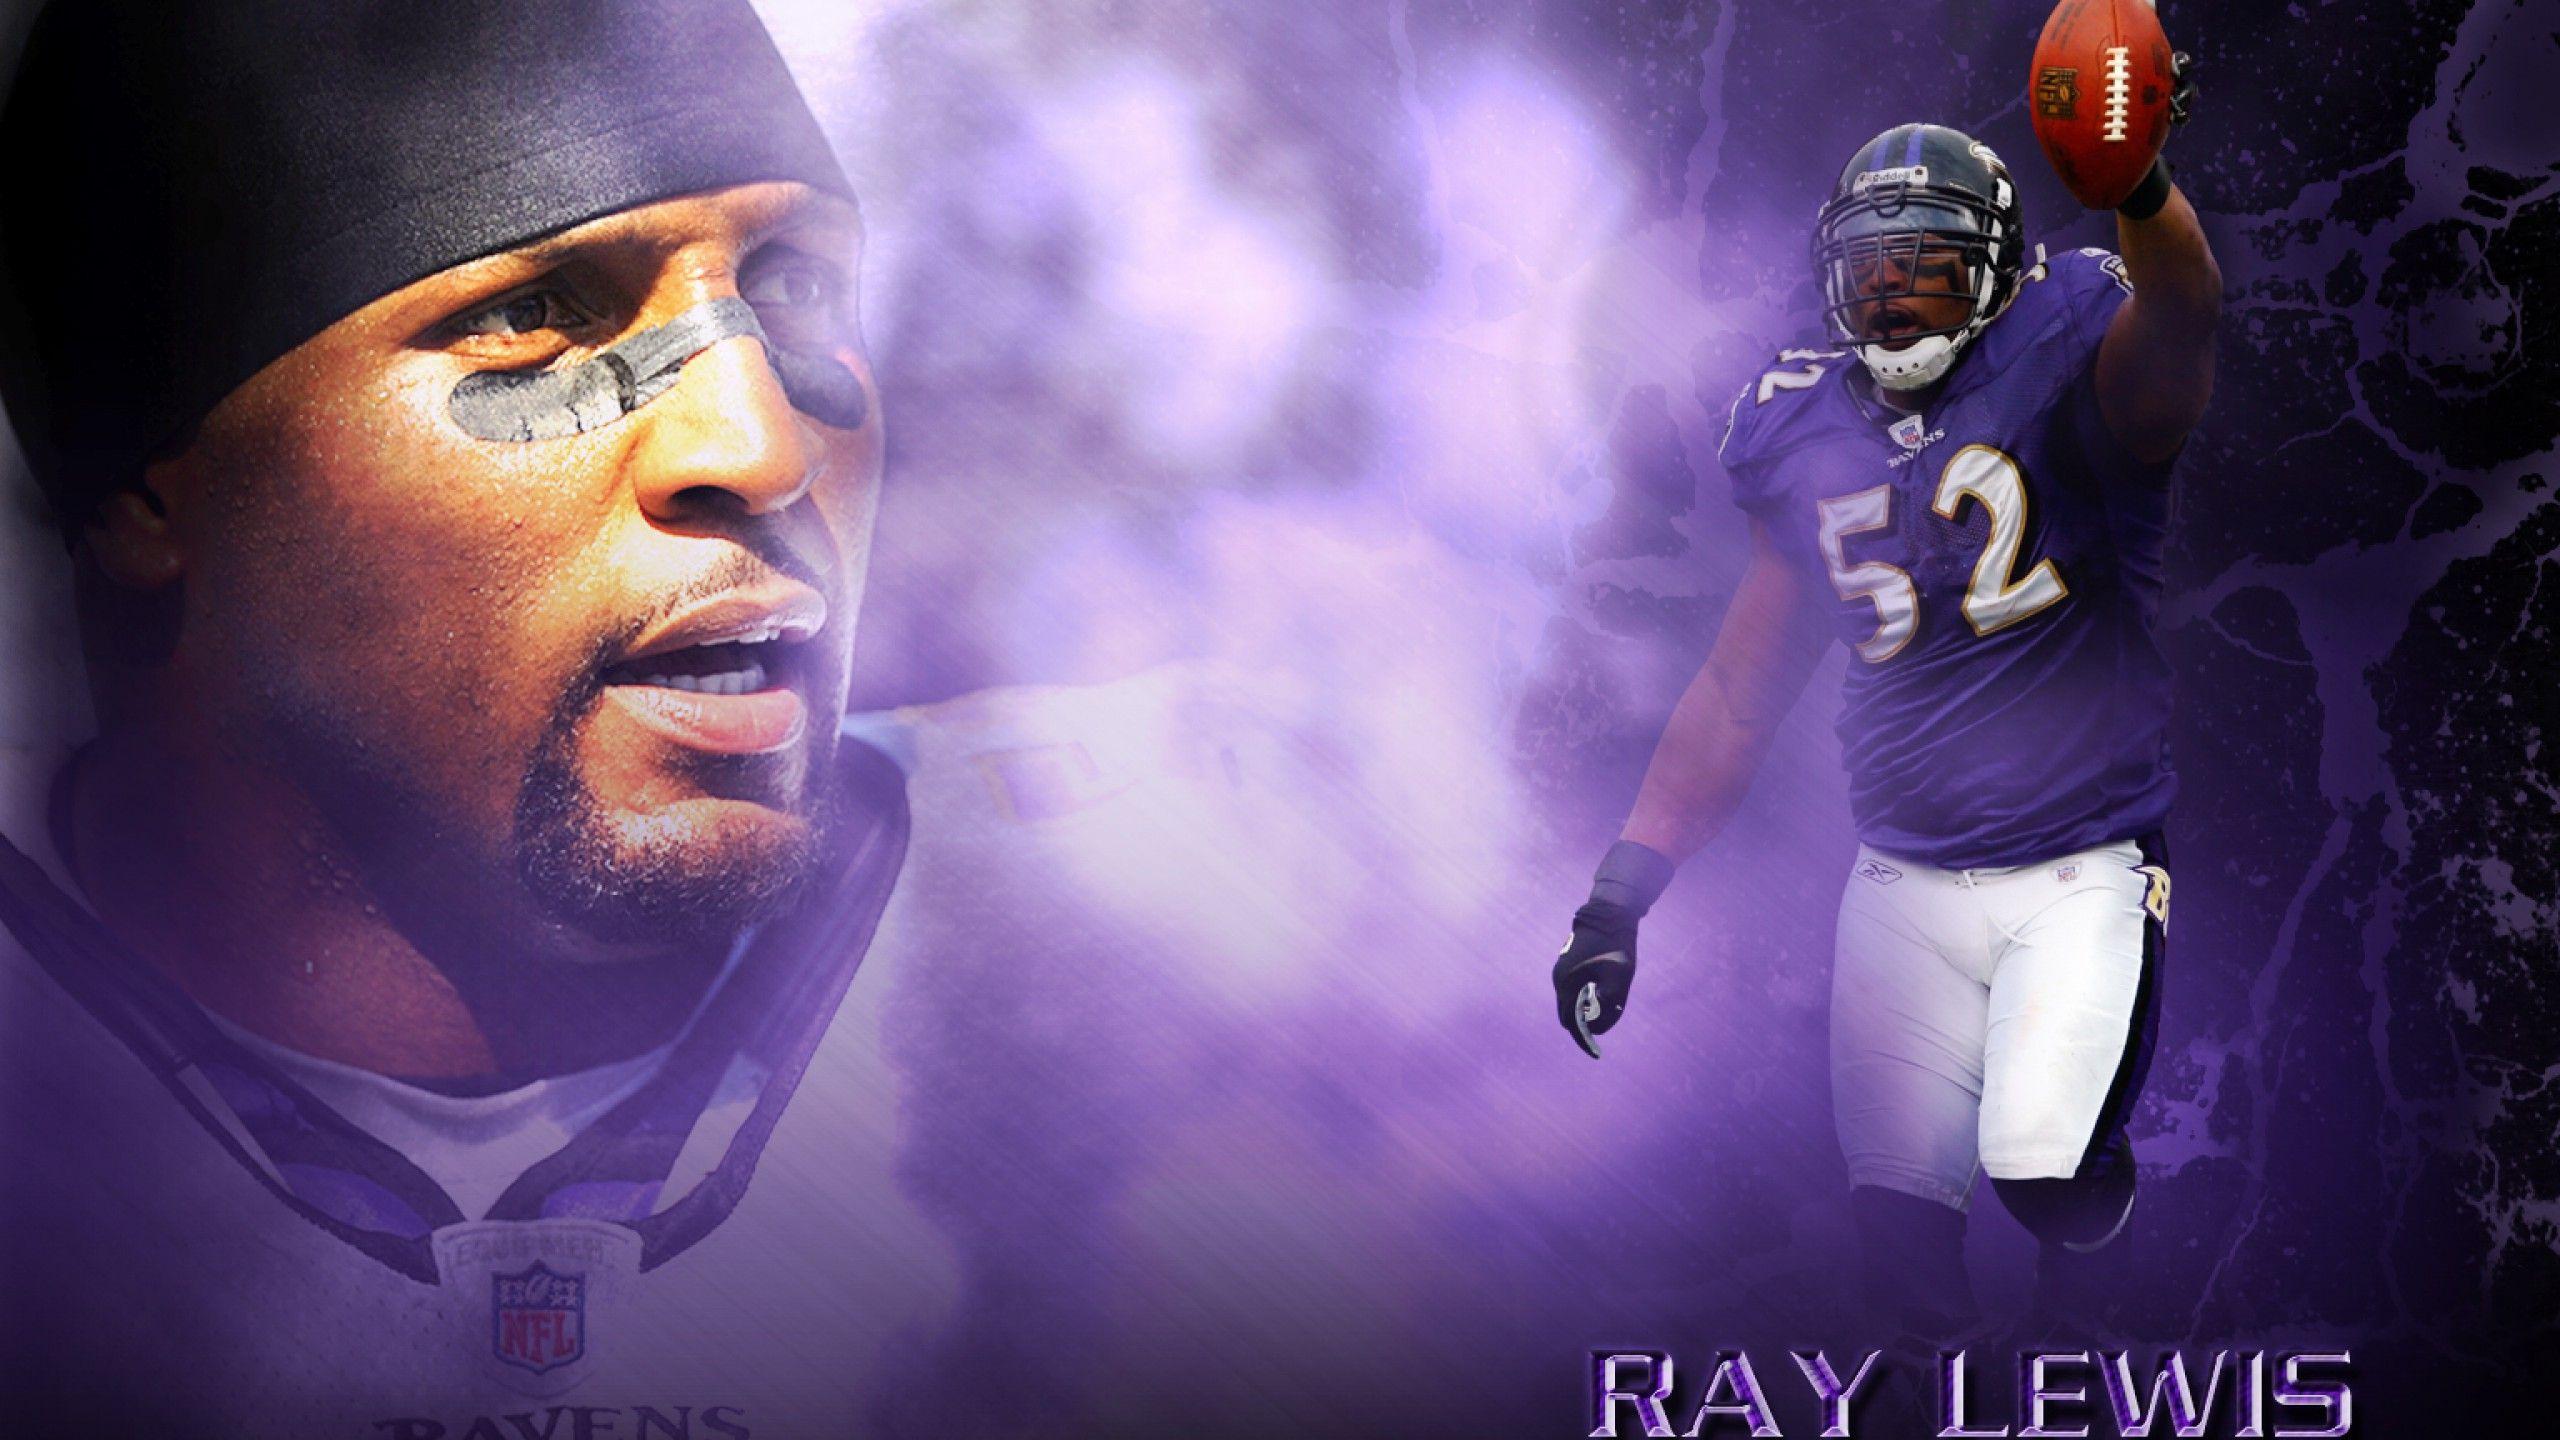 Baltimore Ravens Wallpaper RavensRay LewisValentinesSports